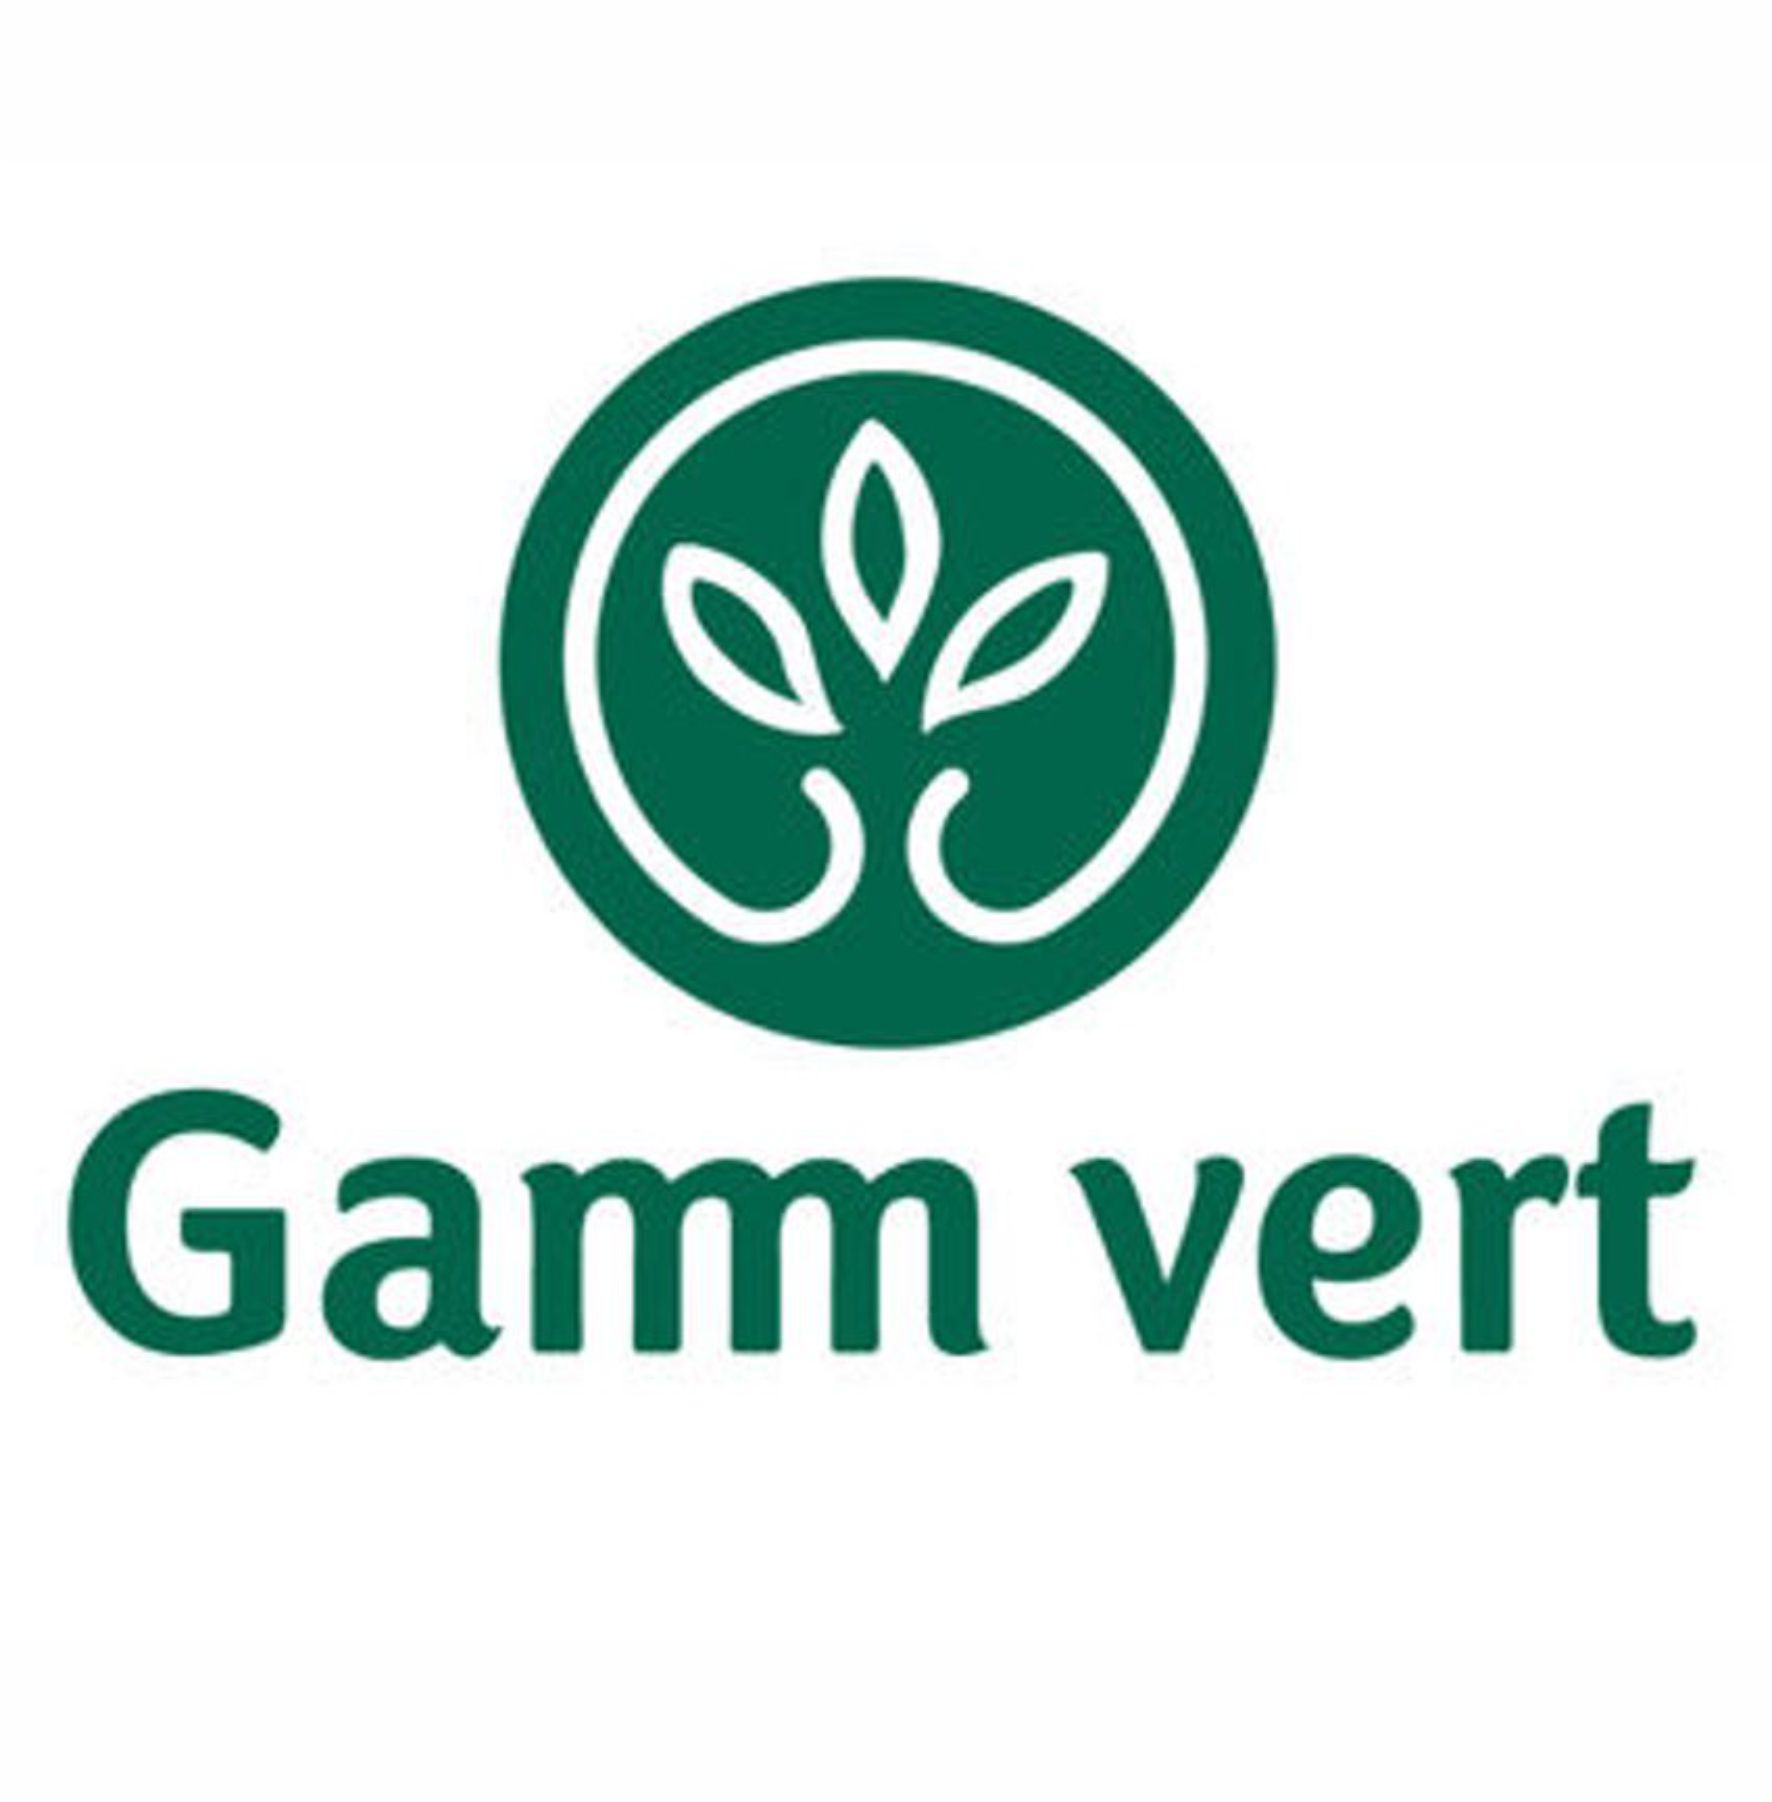 _gamm vert